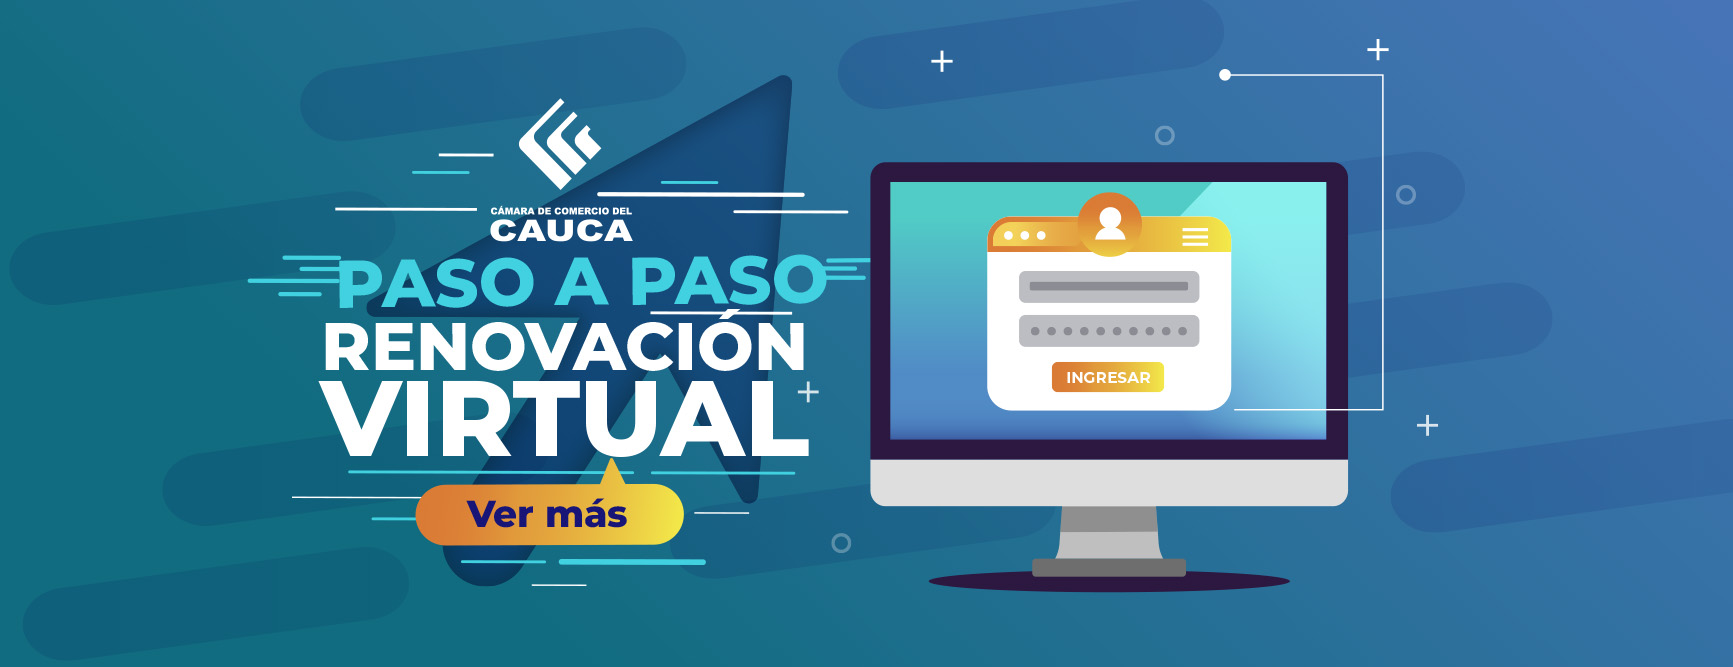 paso_a_paso_renovacion_virtual_cccauca_2020